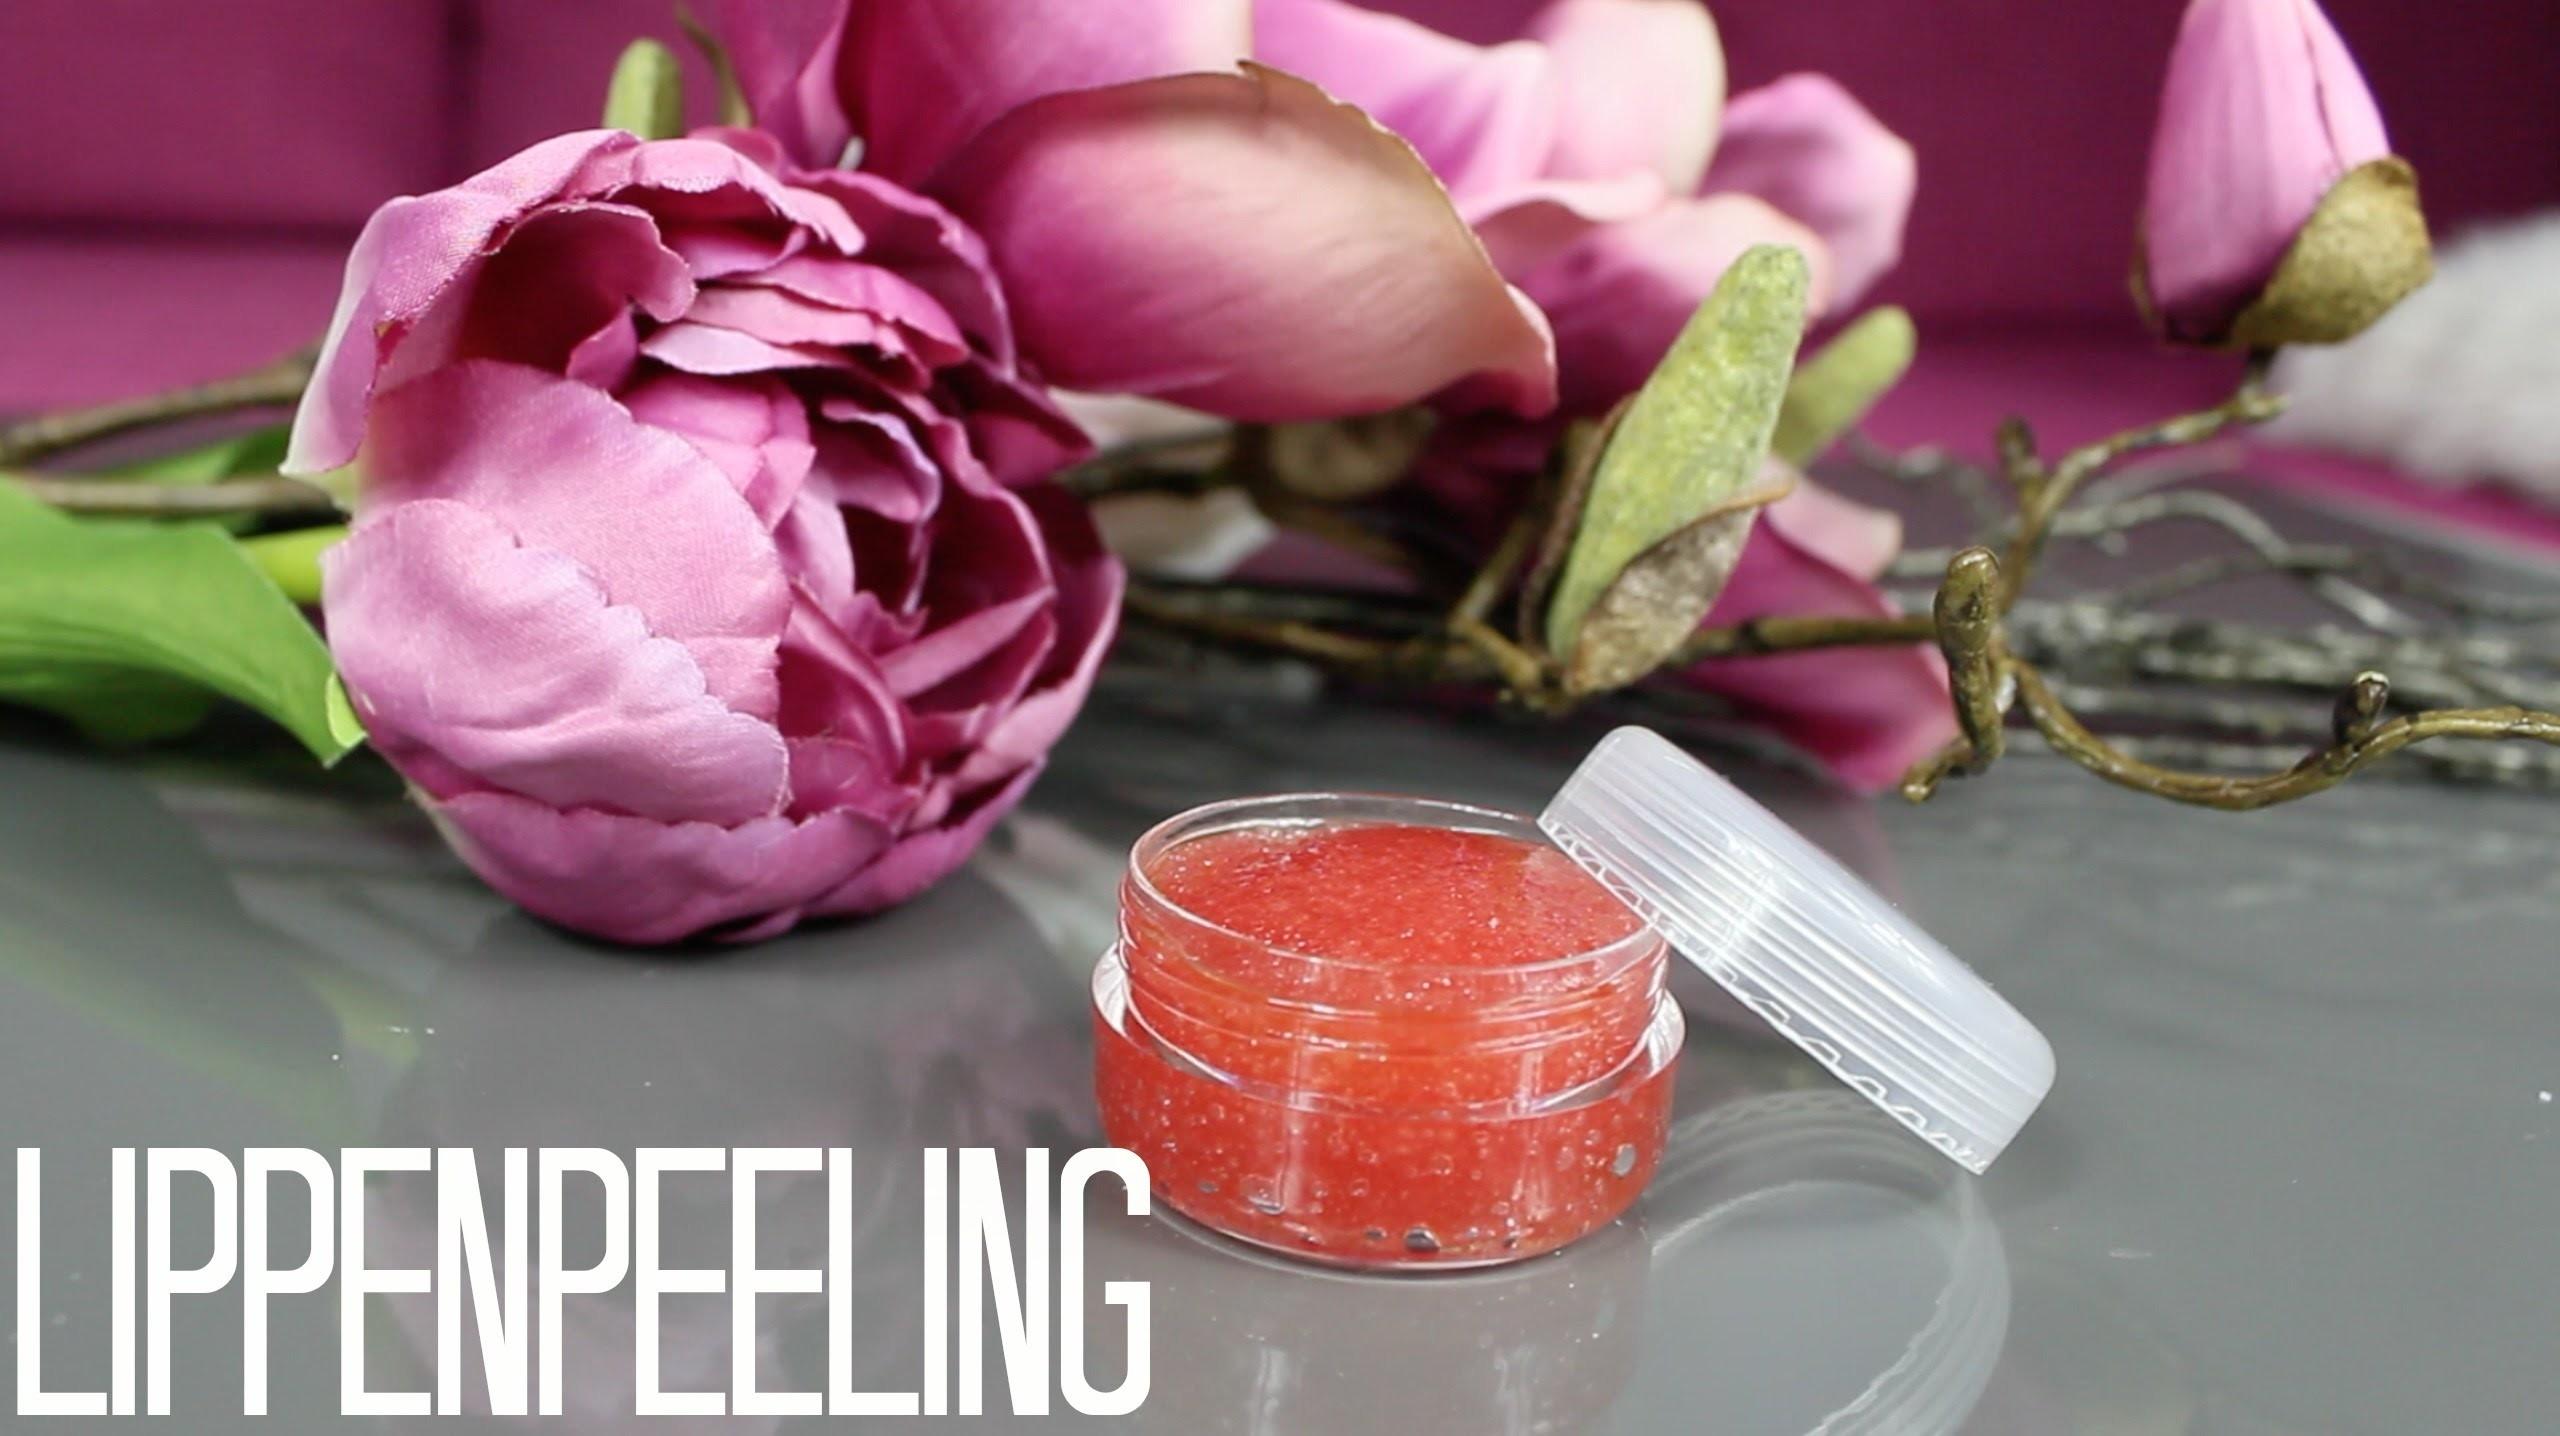 DIY Lippenpeeling. Lip Scrub ♡ | vivianereinhardt